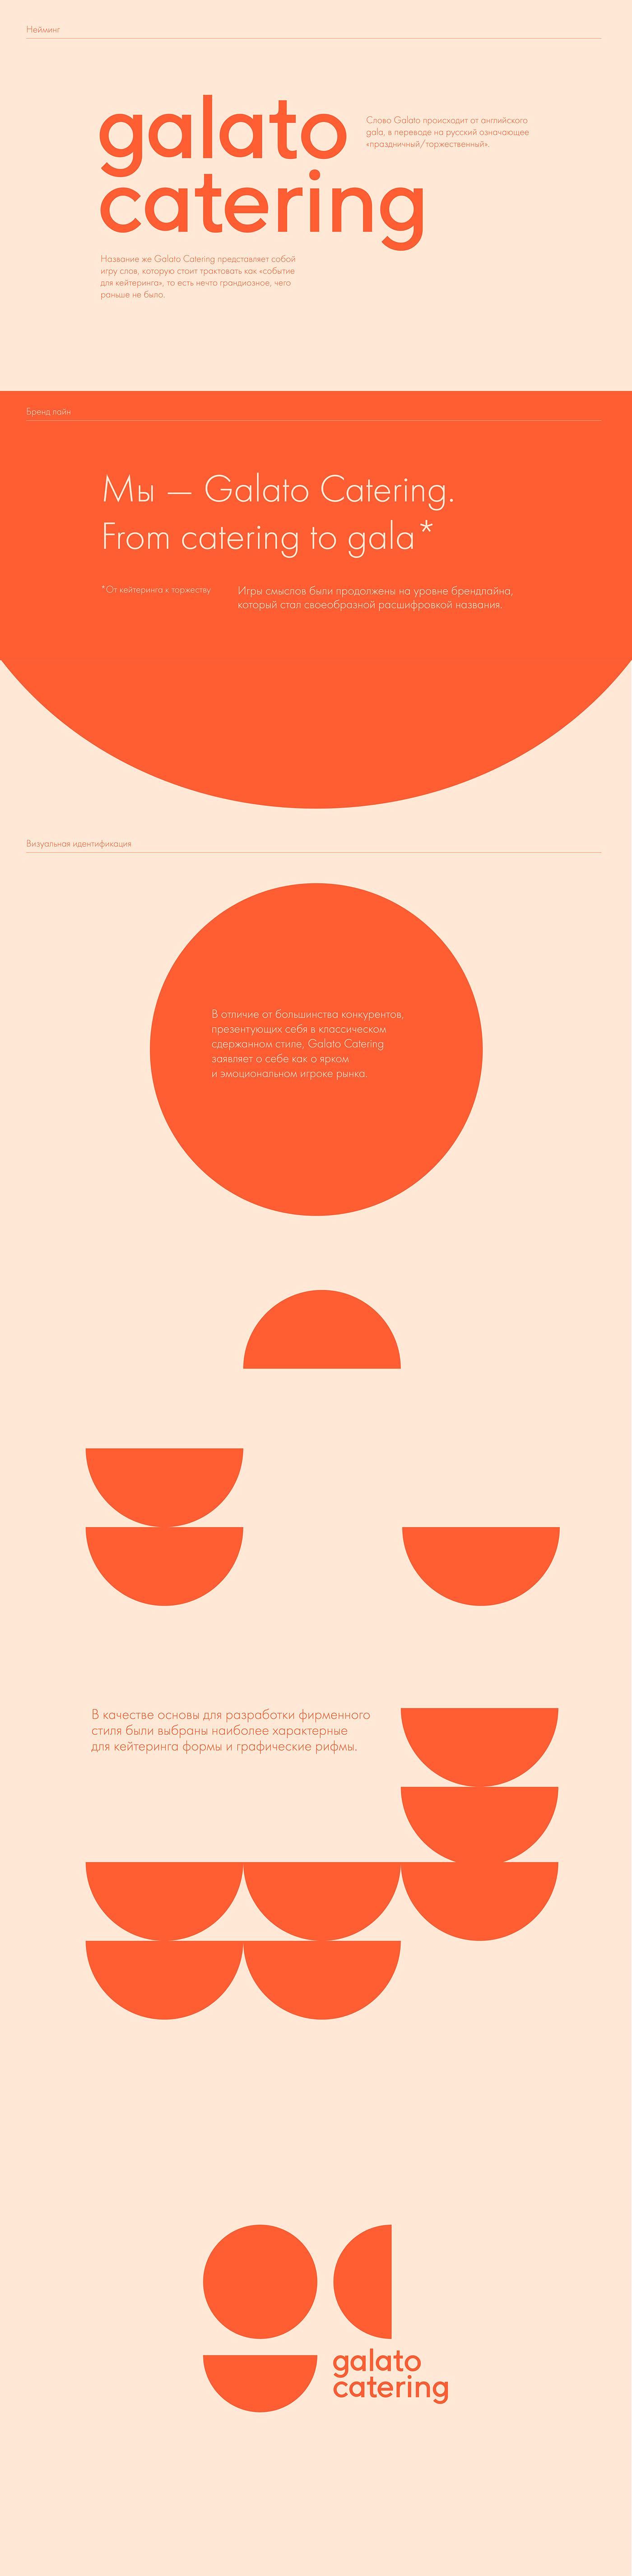 Image may contain: vector graphics, screenshot and illustration